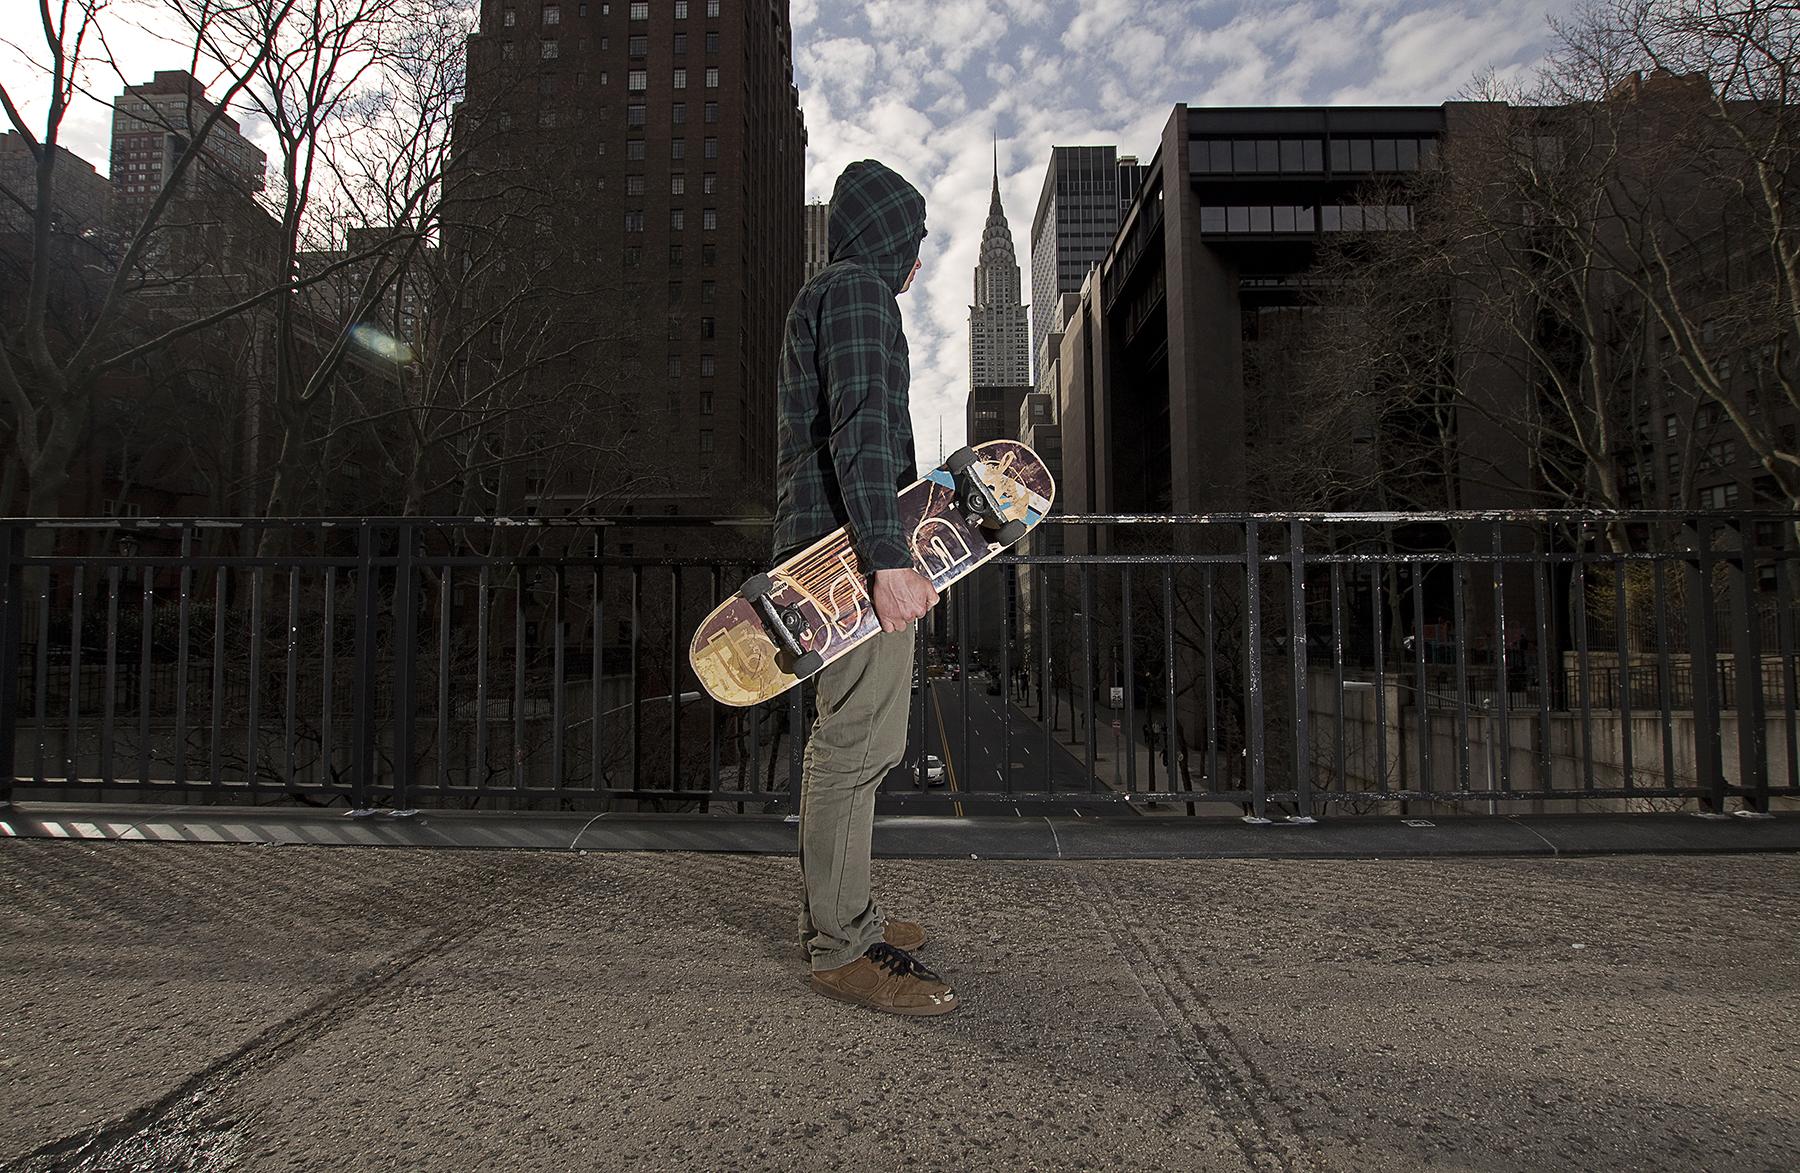 Pete Betti, NYC Skateboard Instructor